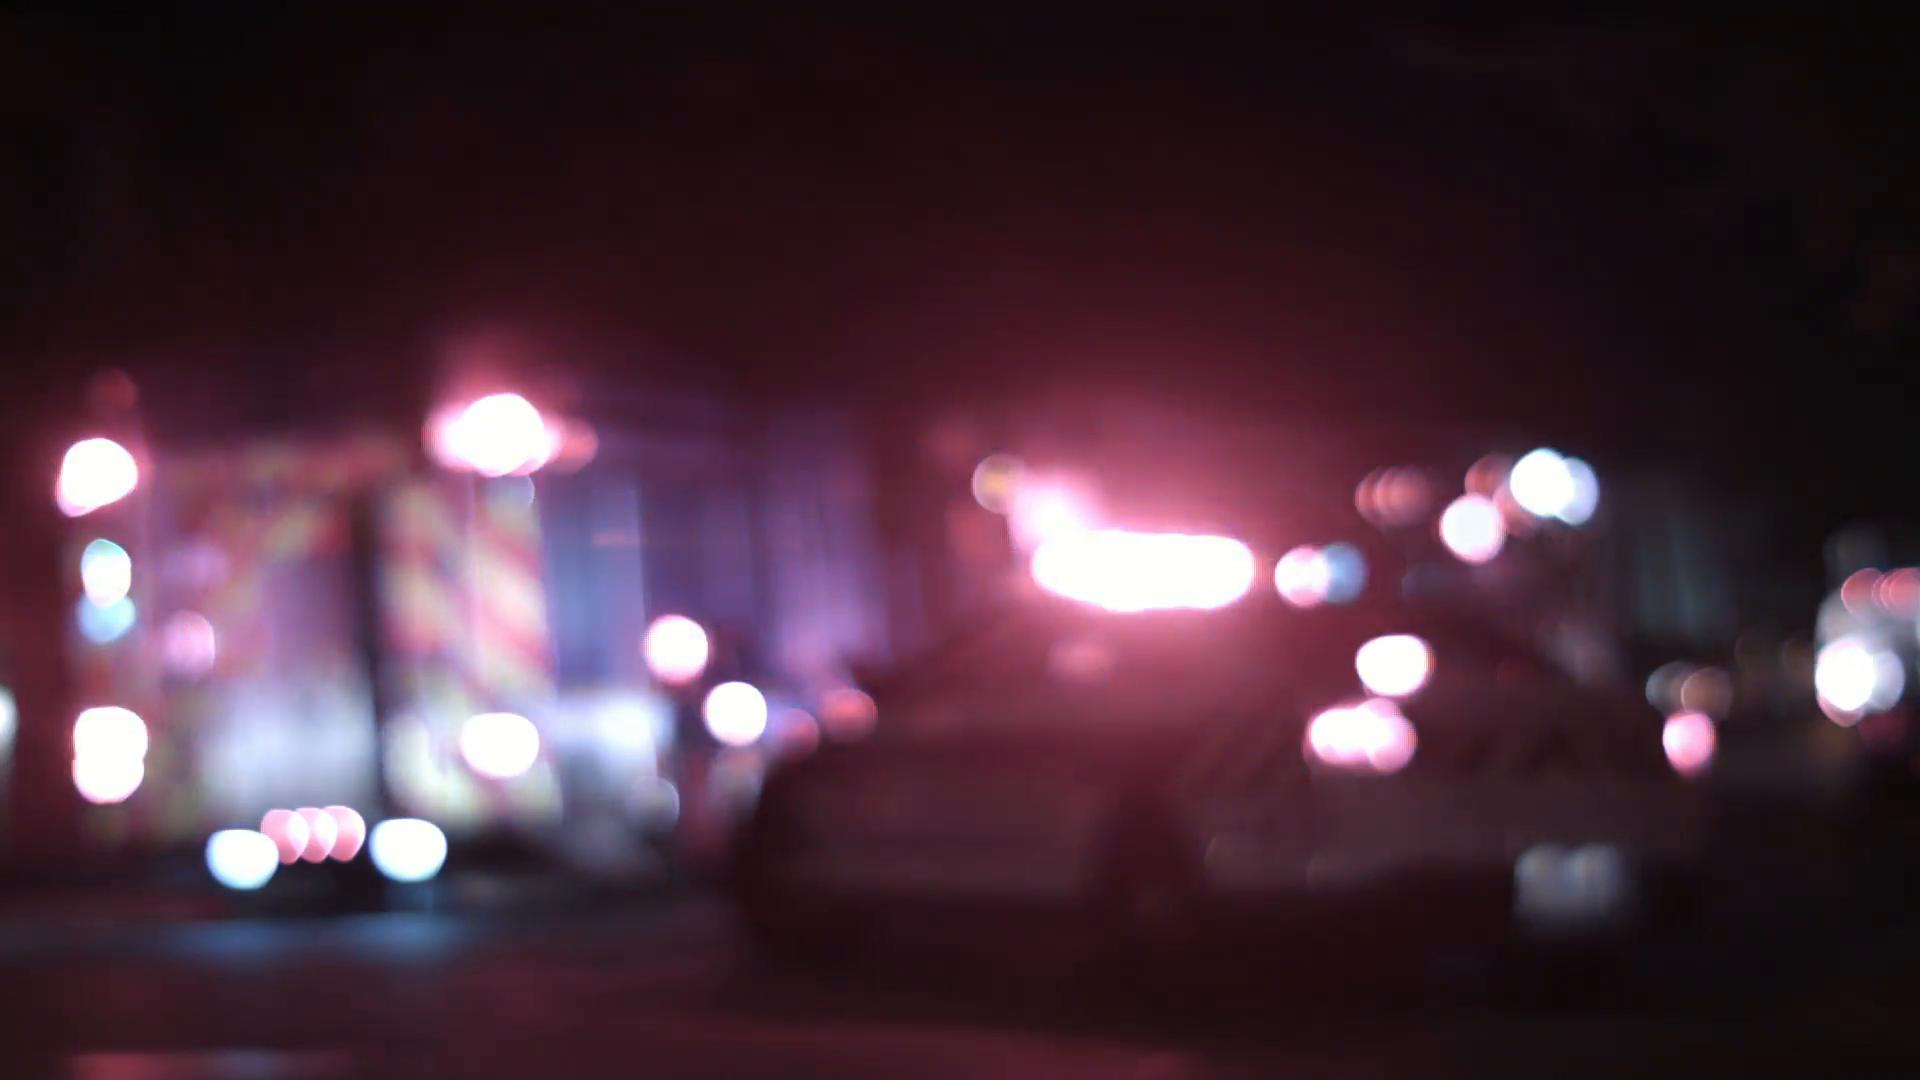 Ambulance Cops and Firetrucks Blurry Lights Background at Night 1920x1080